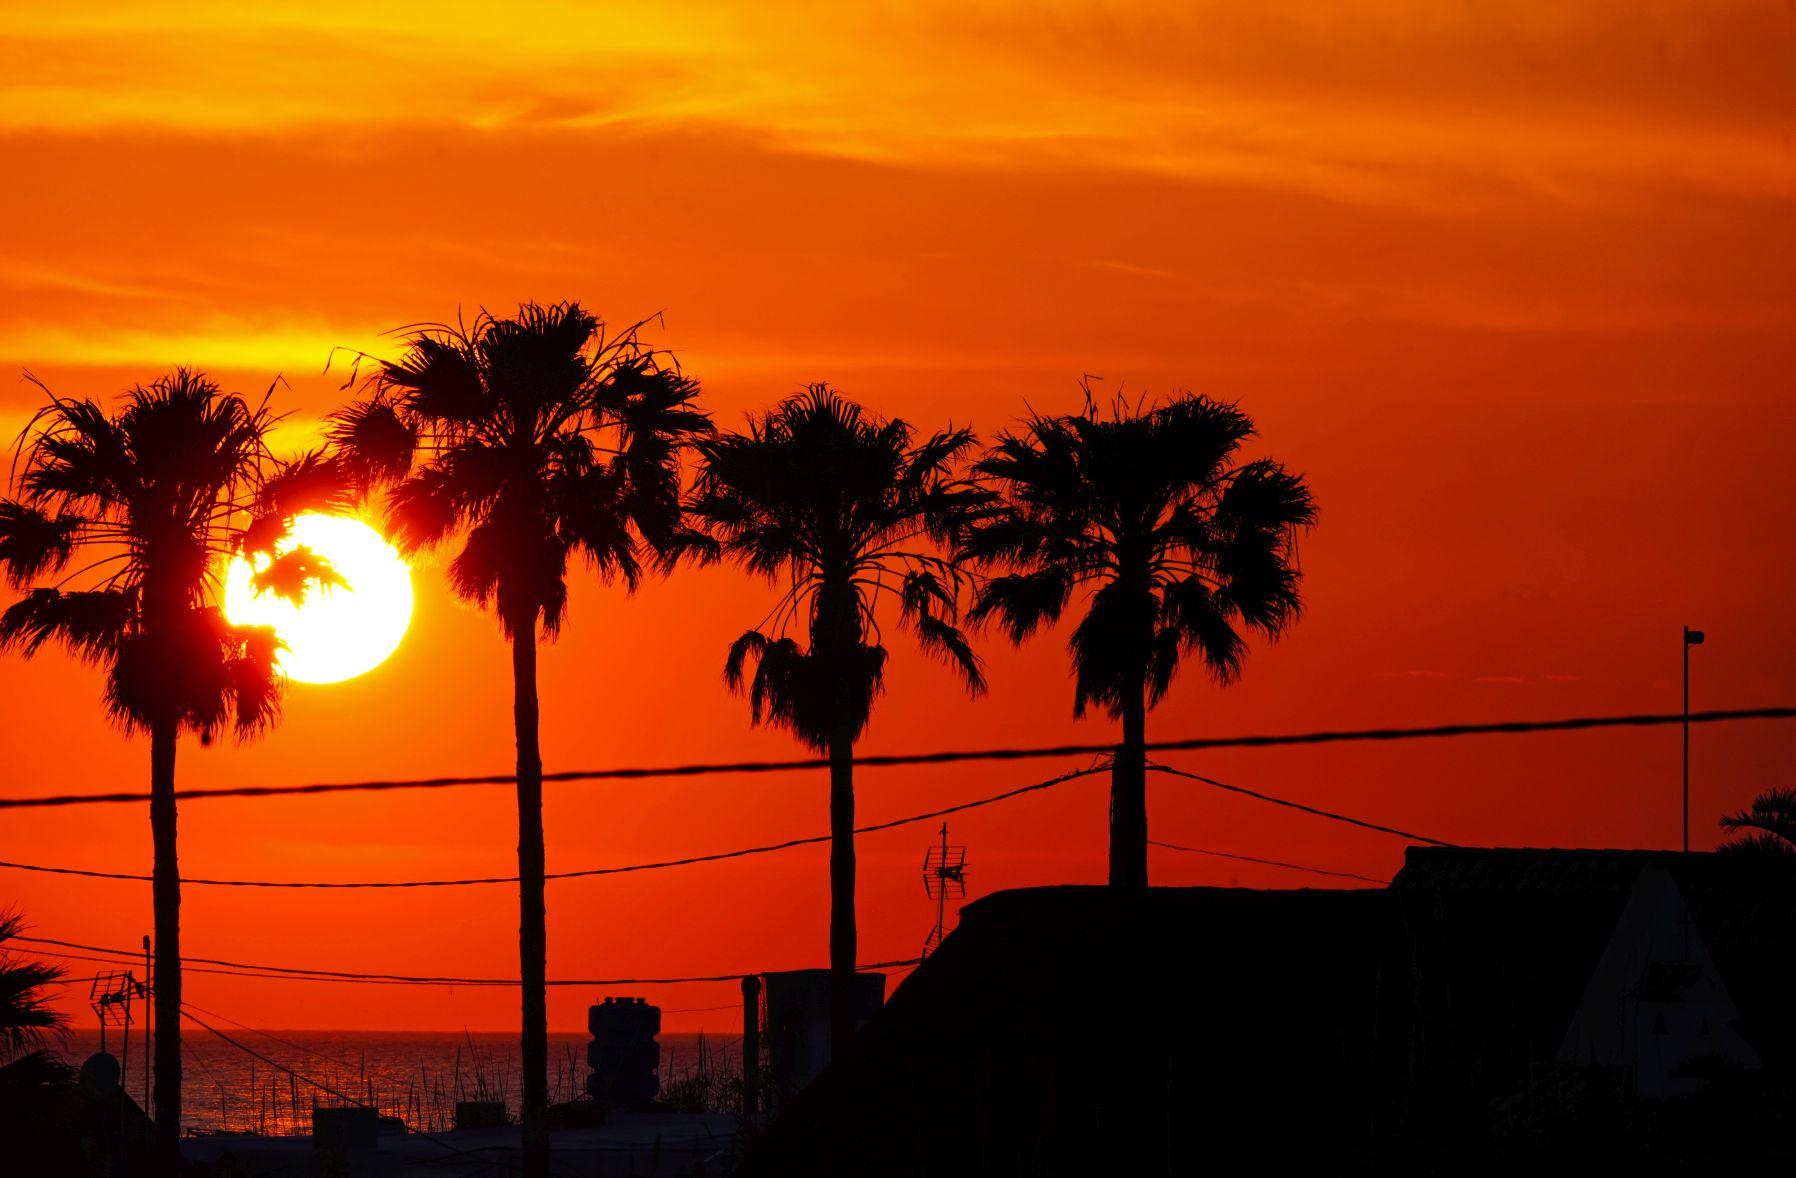 Playa El Palmar bei Sonnenuntergang